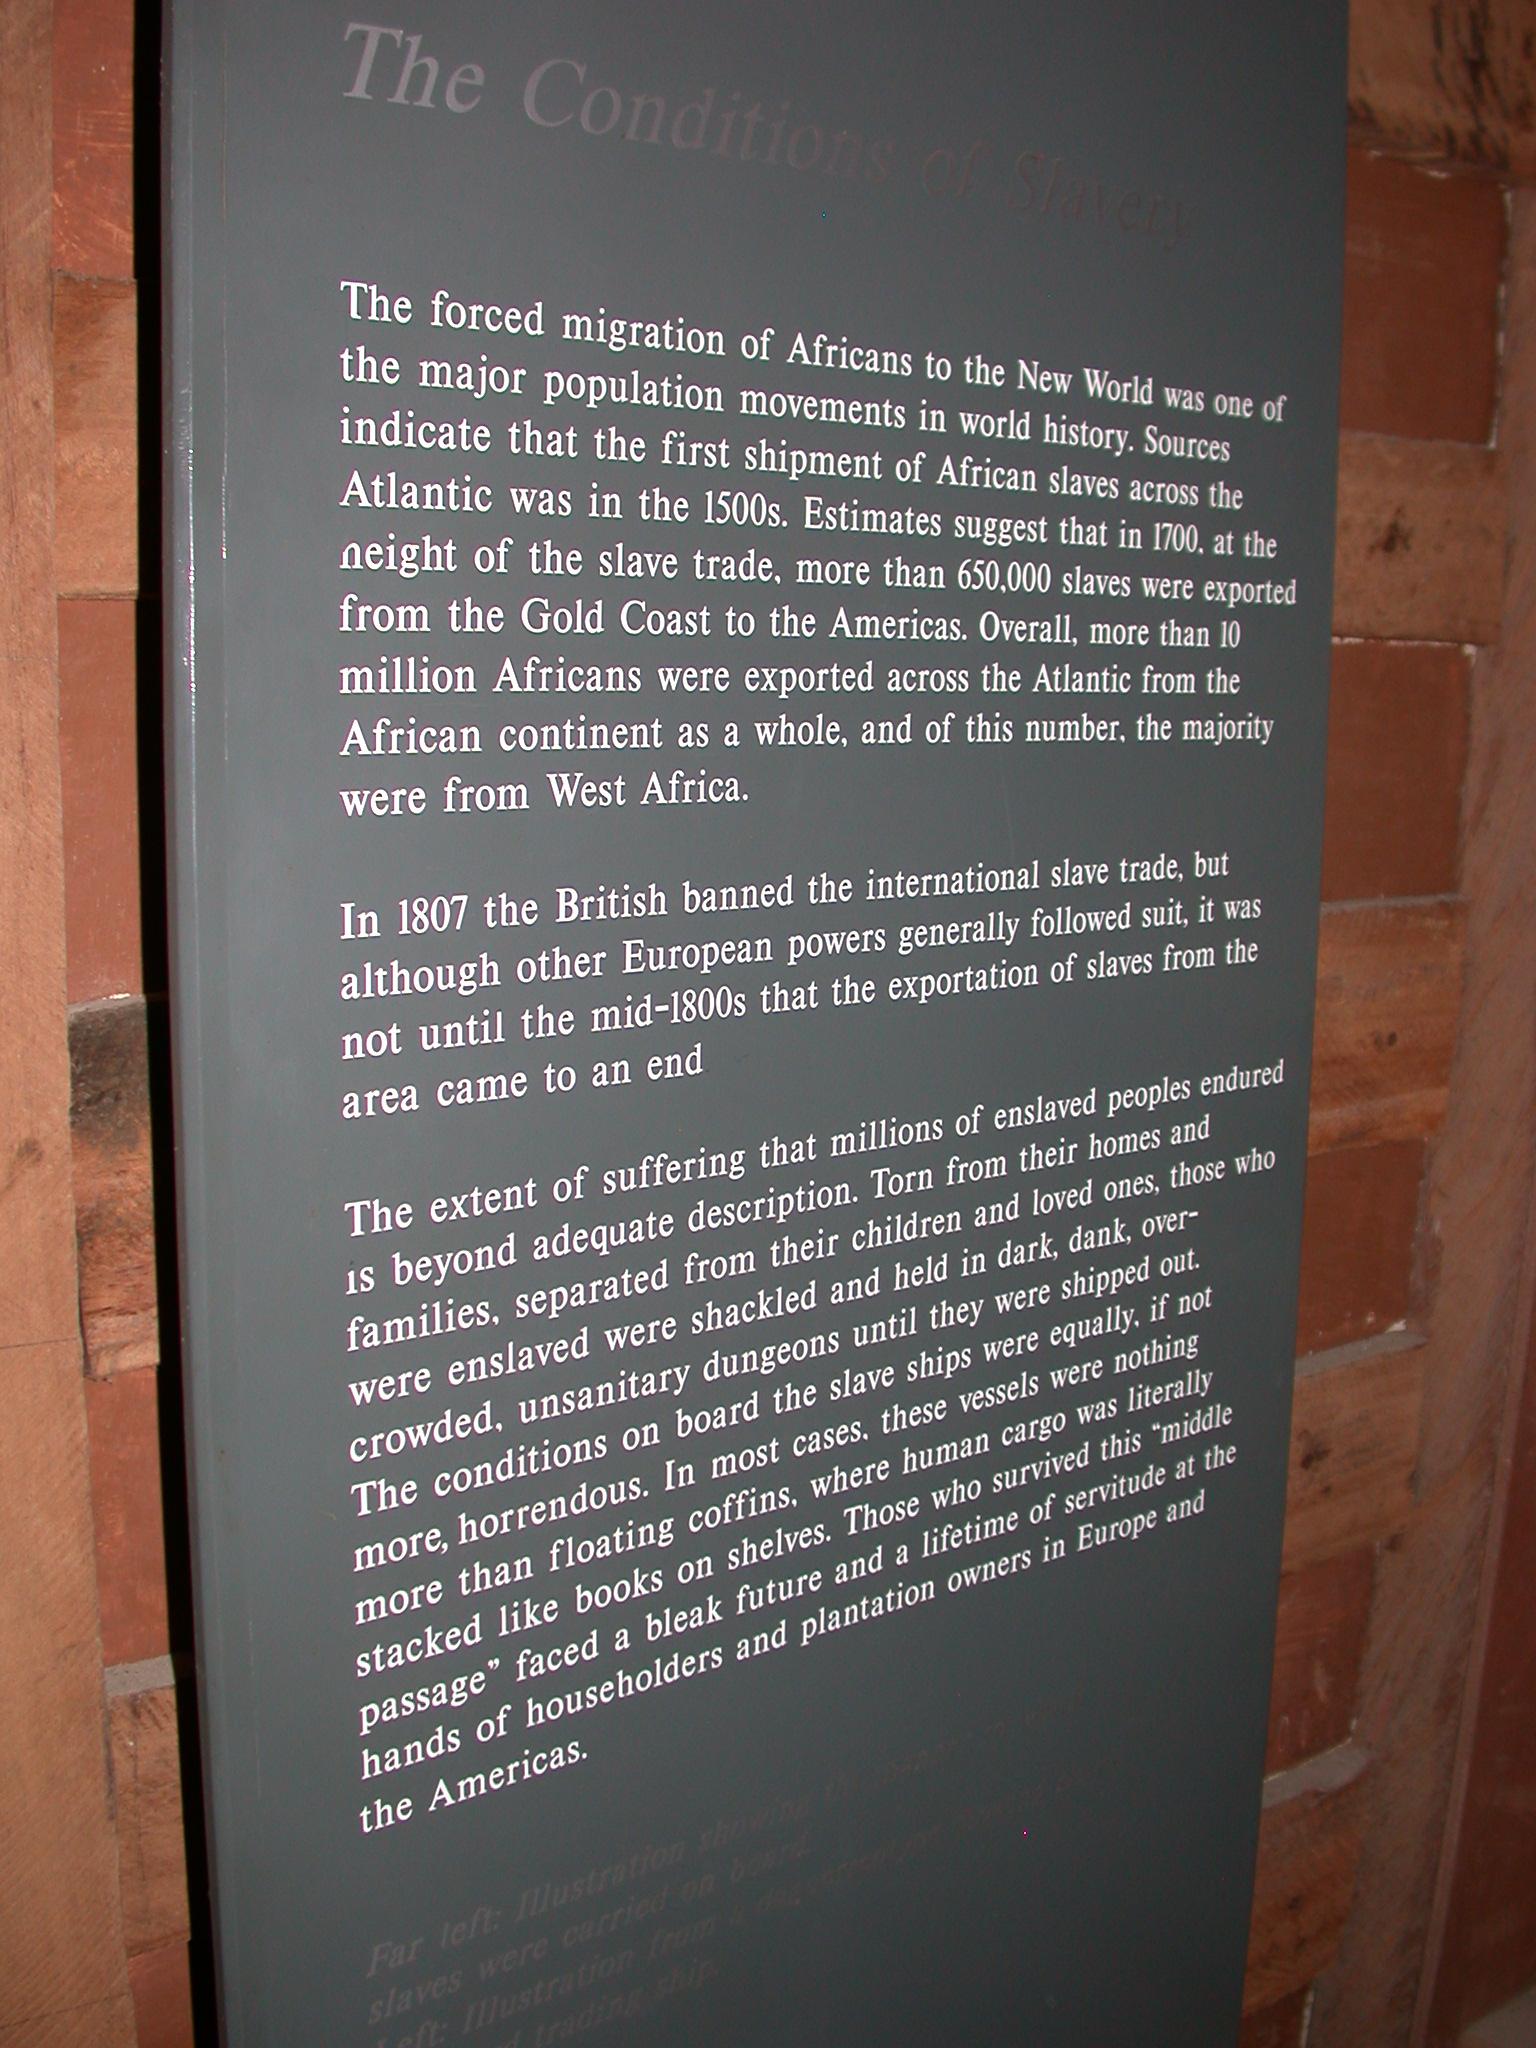 Conditions of Slavery Description, Cape Coast Slave Fort Museum, Cape Coast, Ghana